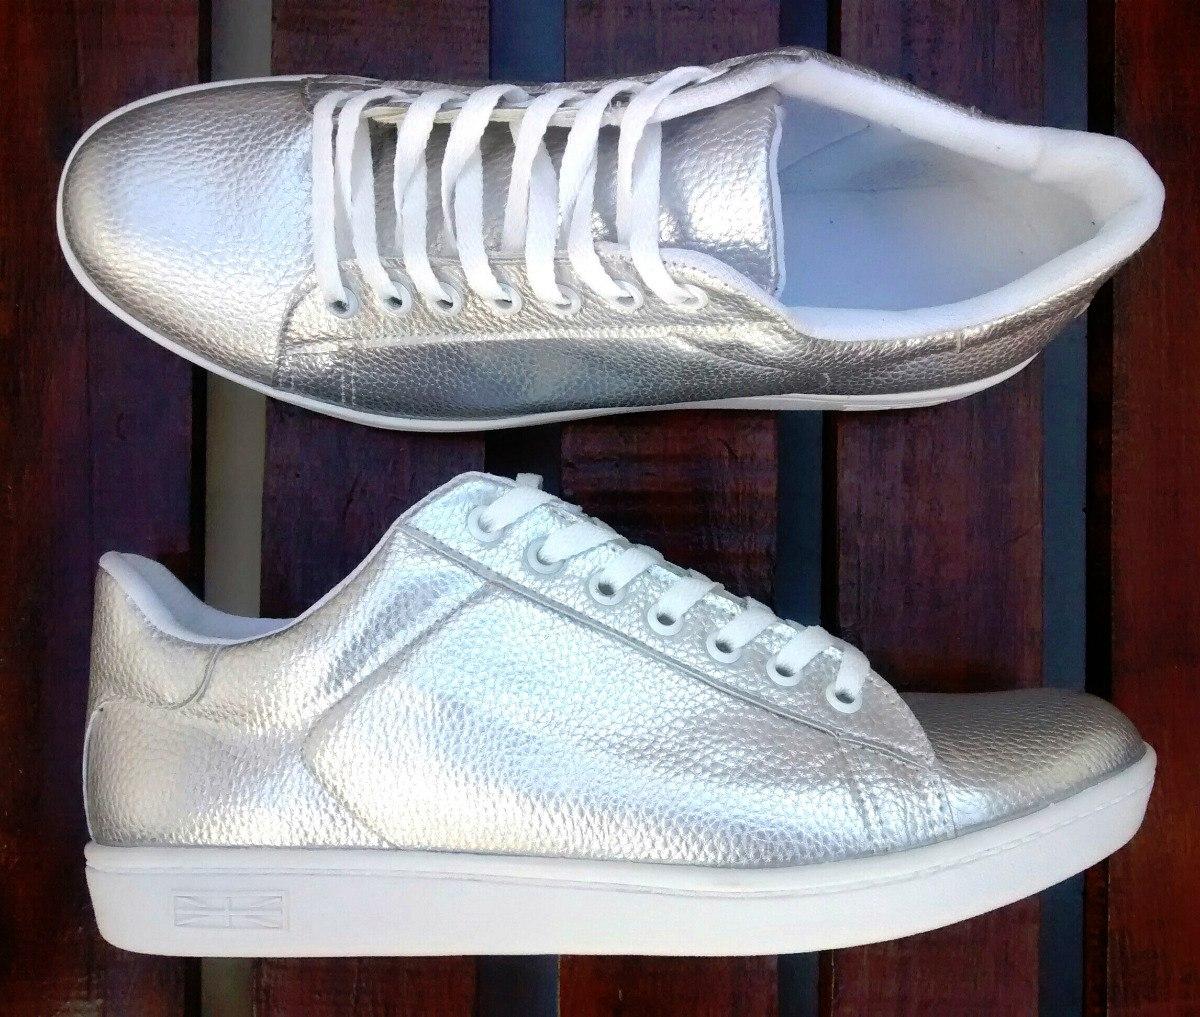 Zapatillas Plateadas Mujer Talles 35 2ec604a16be9a